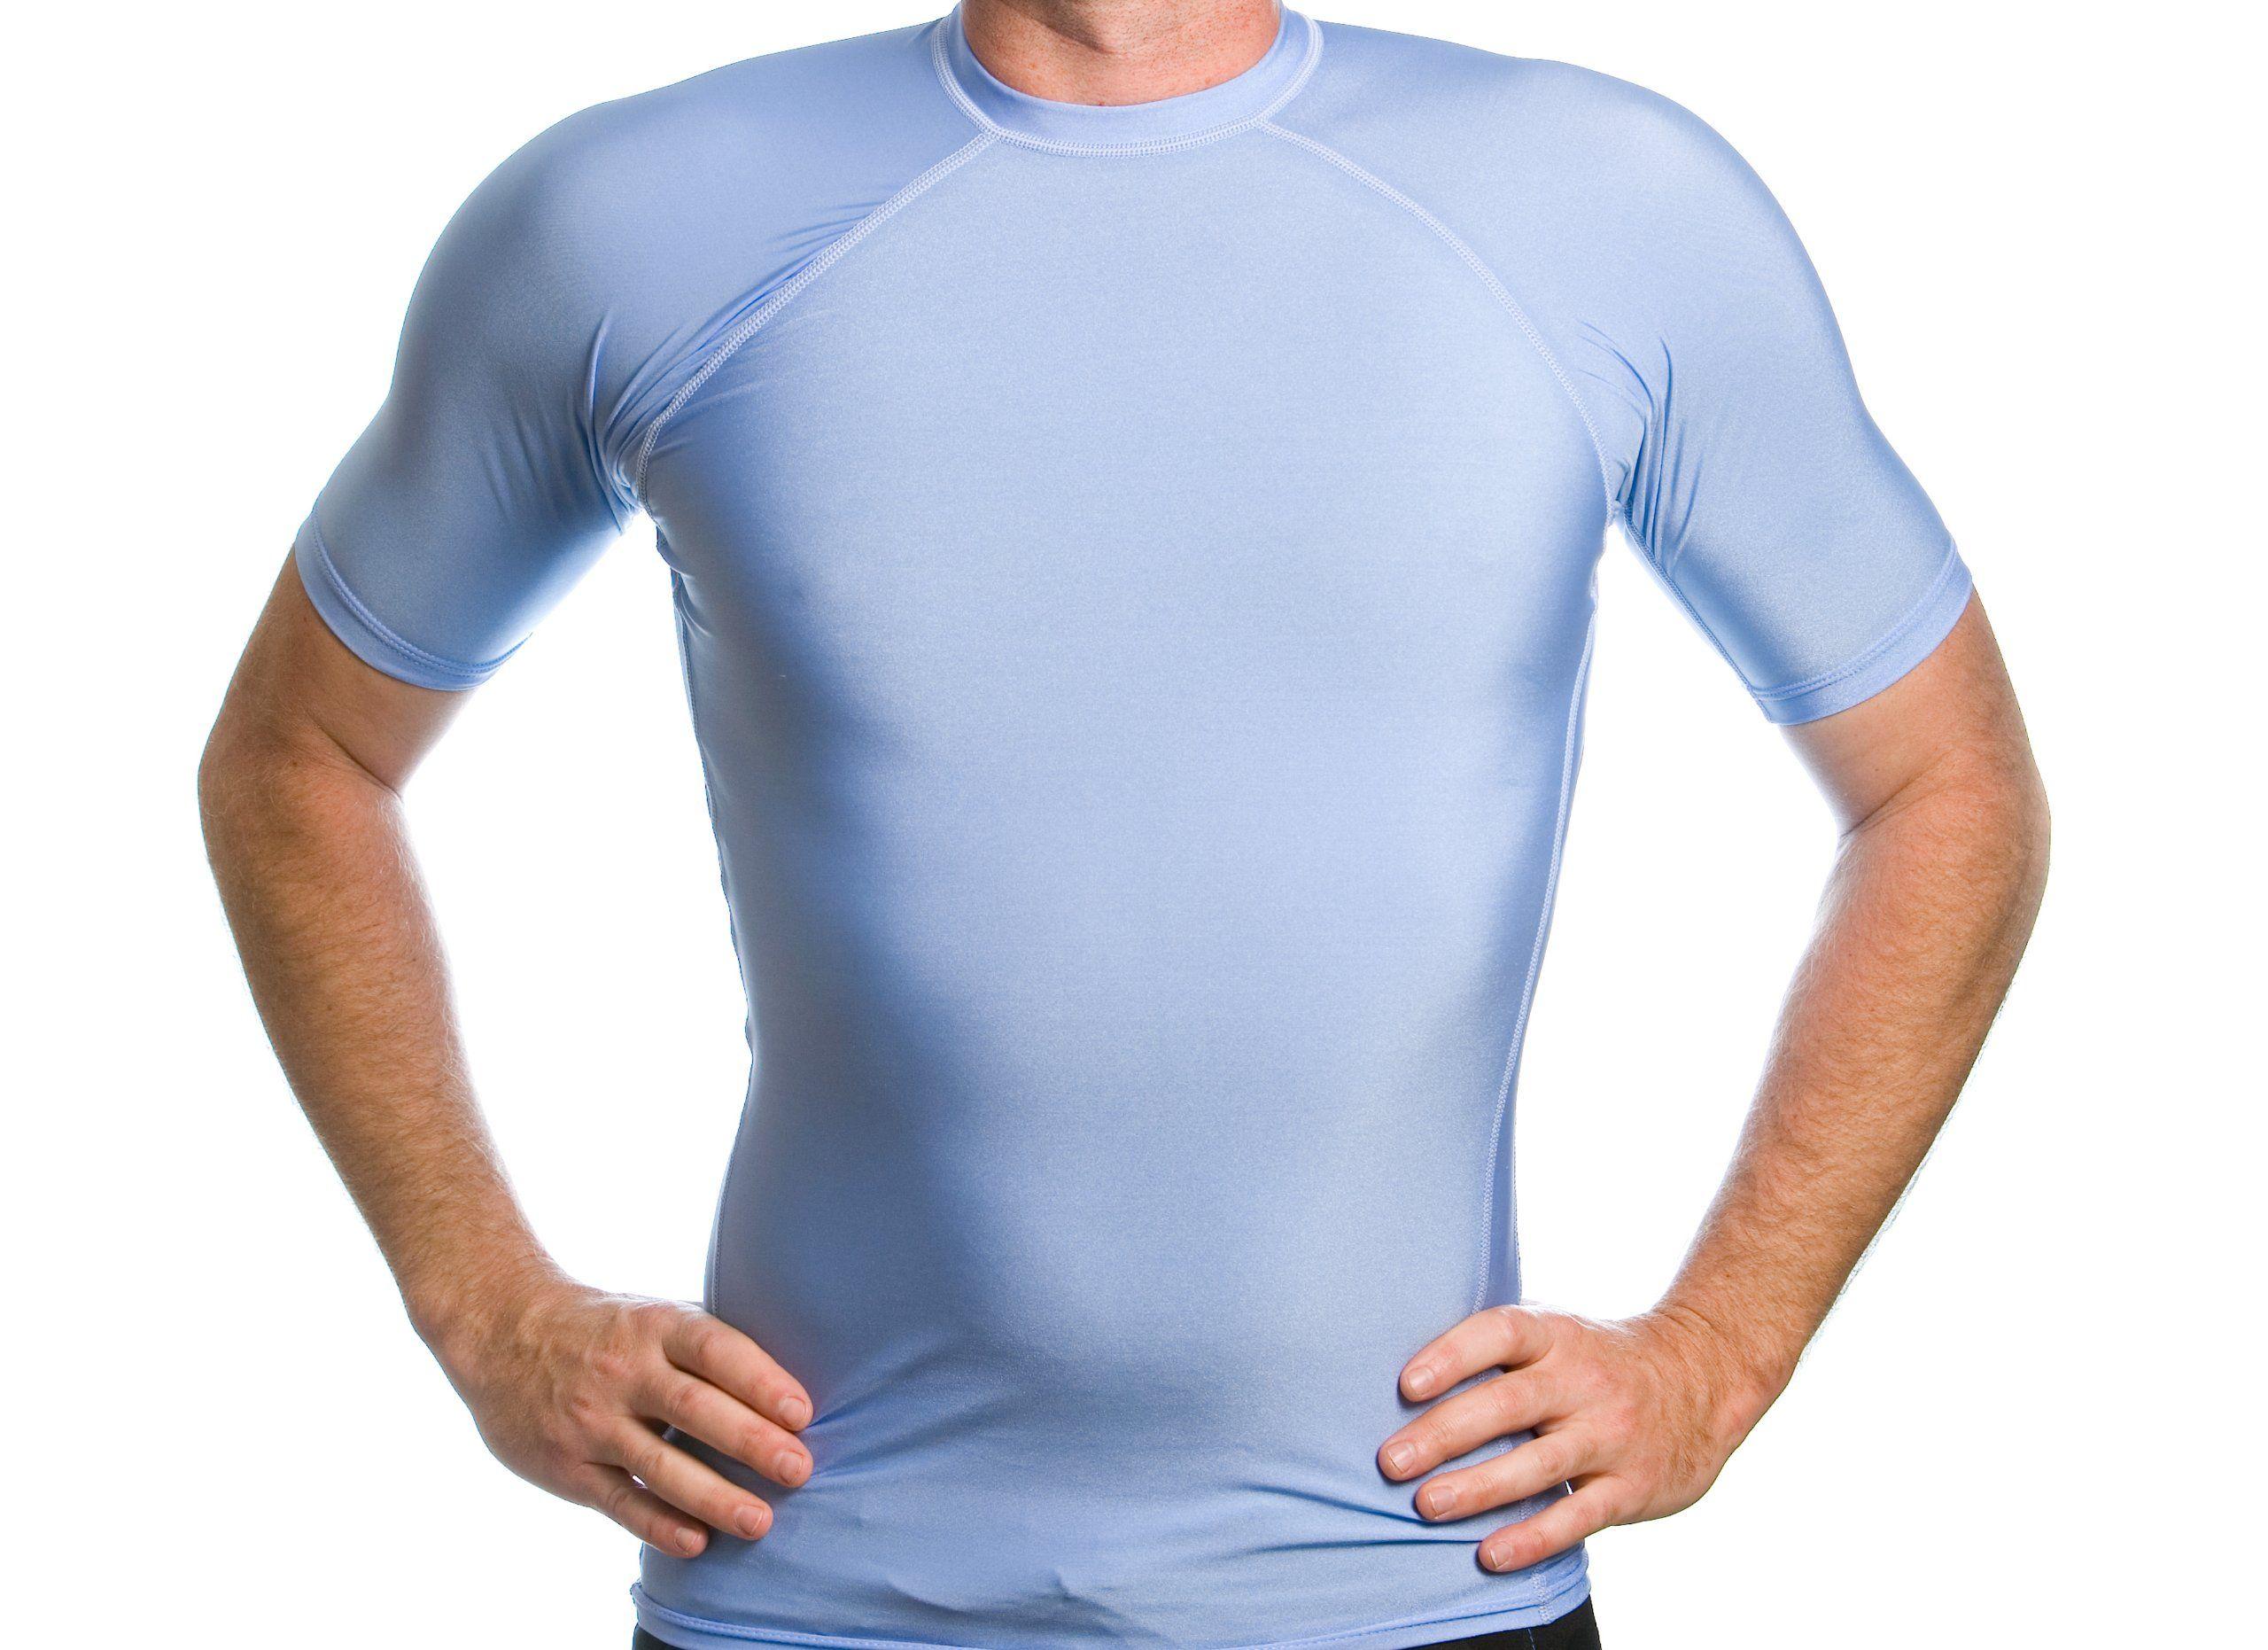 Youth Girls Short Sleeve UPF 50+ Swim Shirt Beach Depot UV Sun Protection Made in USA Kids and Toddler Swimming Tees